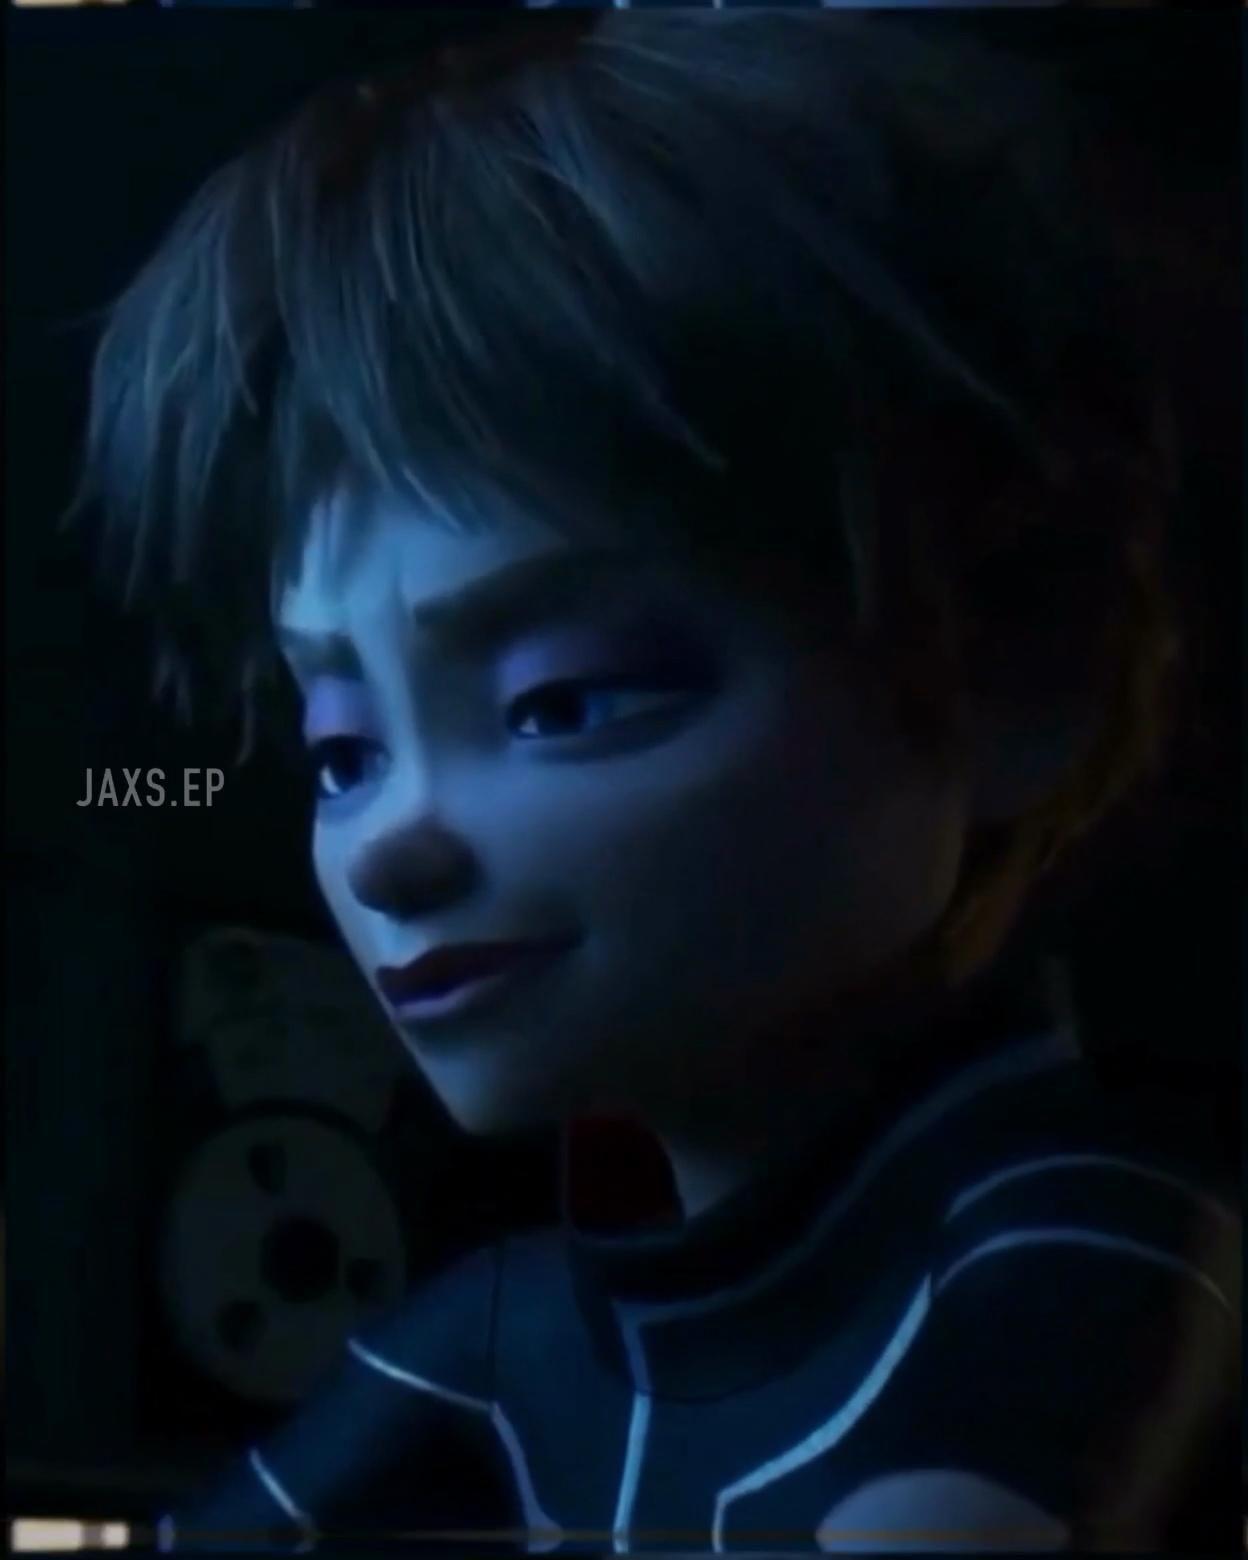 #edit #disney #anime #pixar #incredibles #frozenelsa #trending #top #tiktok